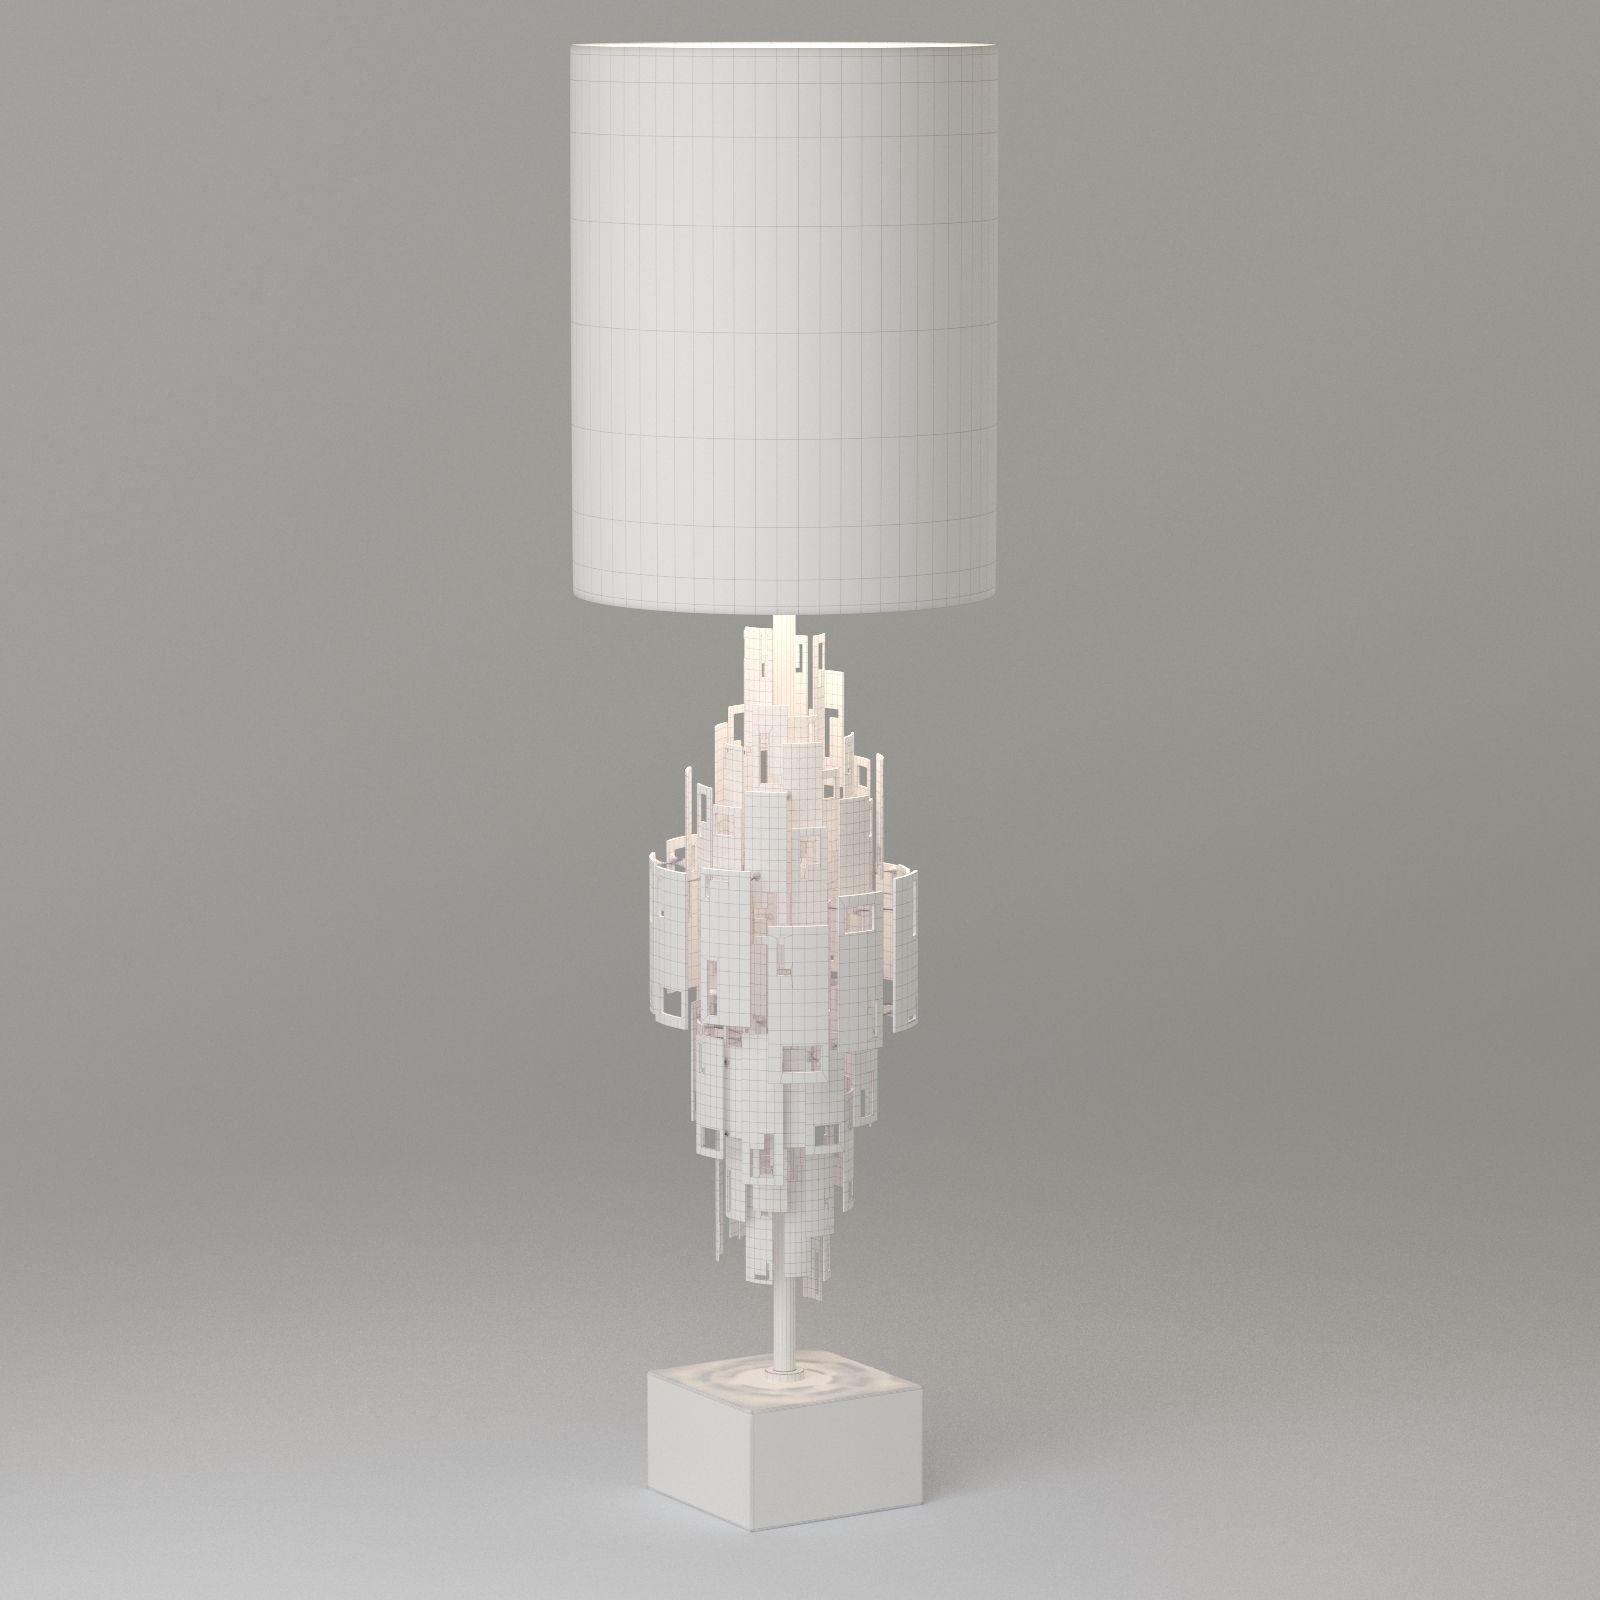 Lampada Da Tavolo 1 Light 3D Model .max .obj .fbx - CGTrader.com